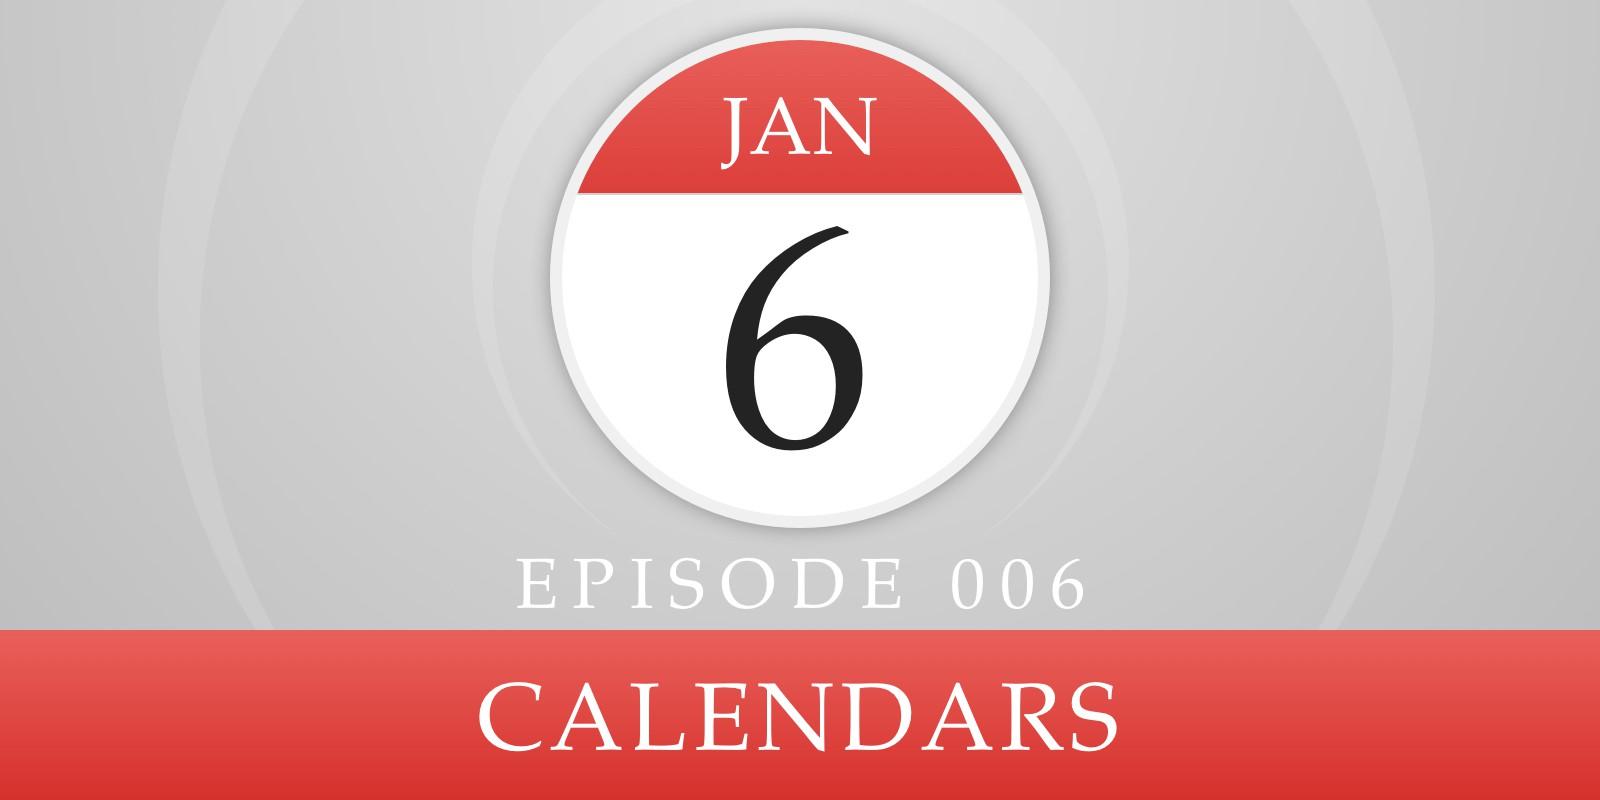 Episode 006: Calendars